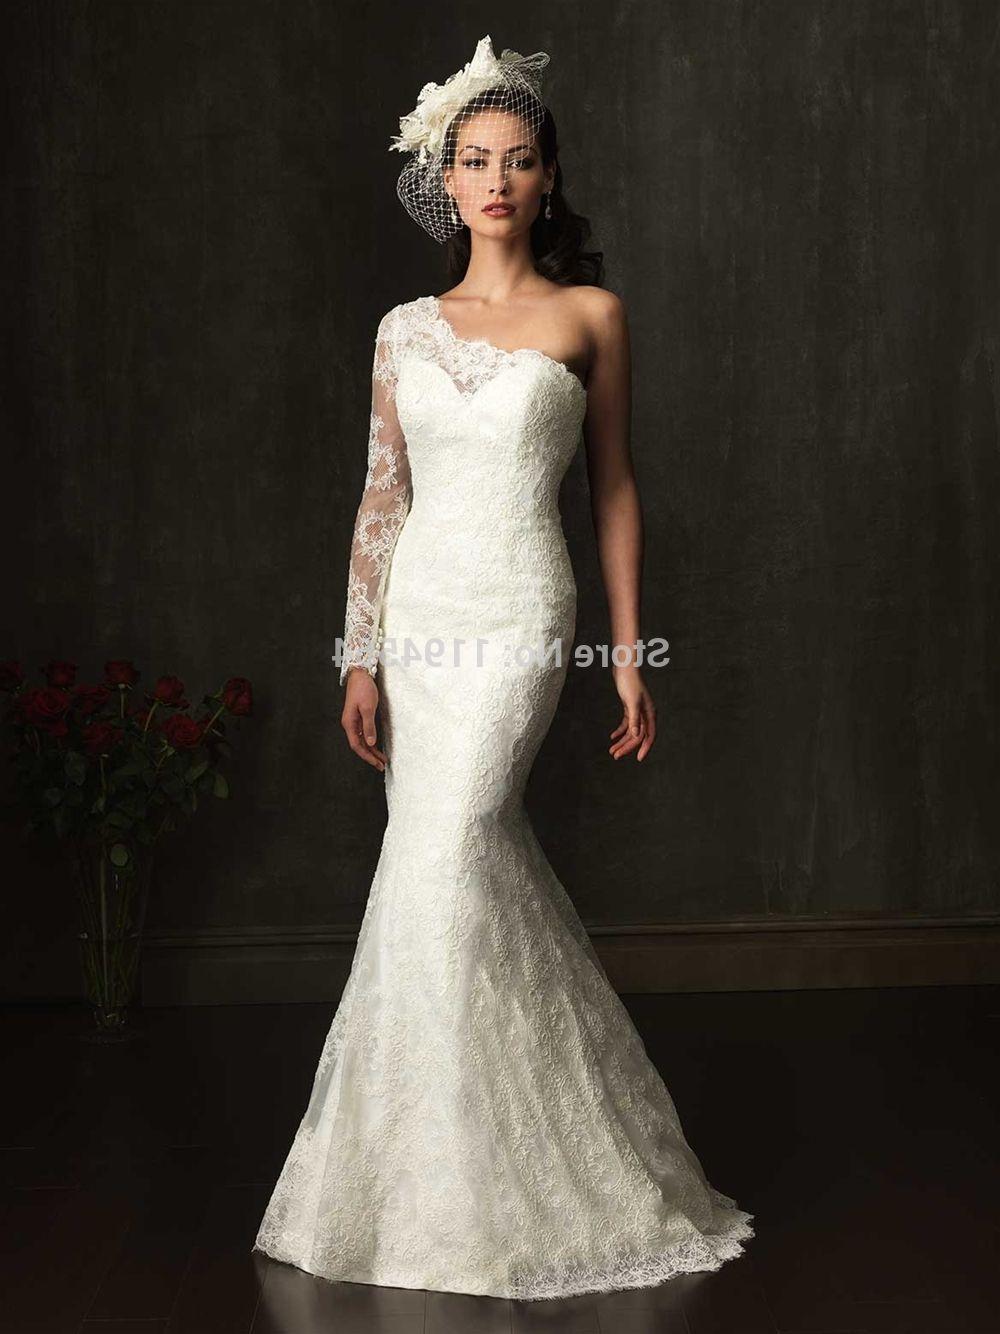 Long Sleeve One Shoulder Wedding Dress Longsleeve Dress